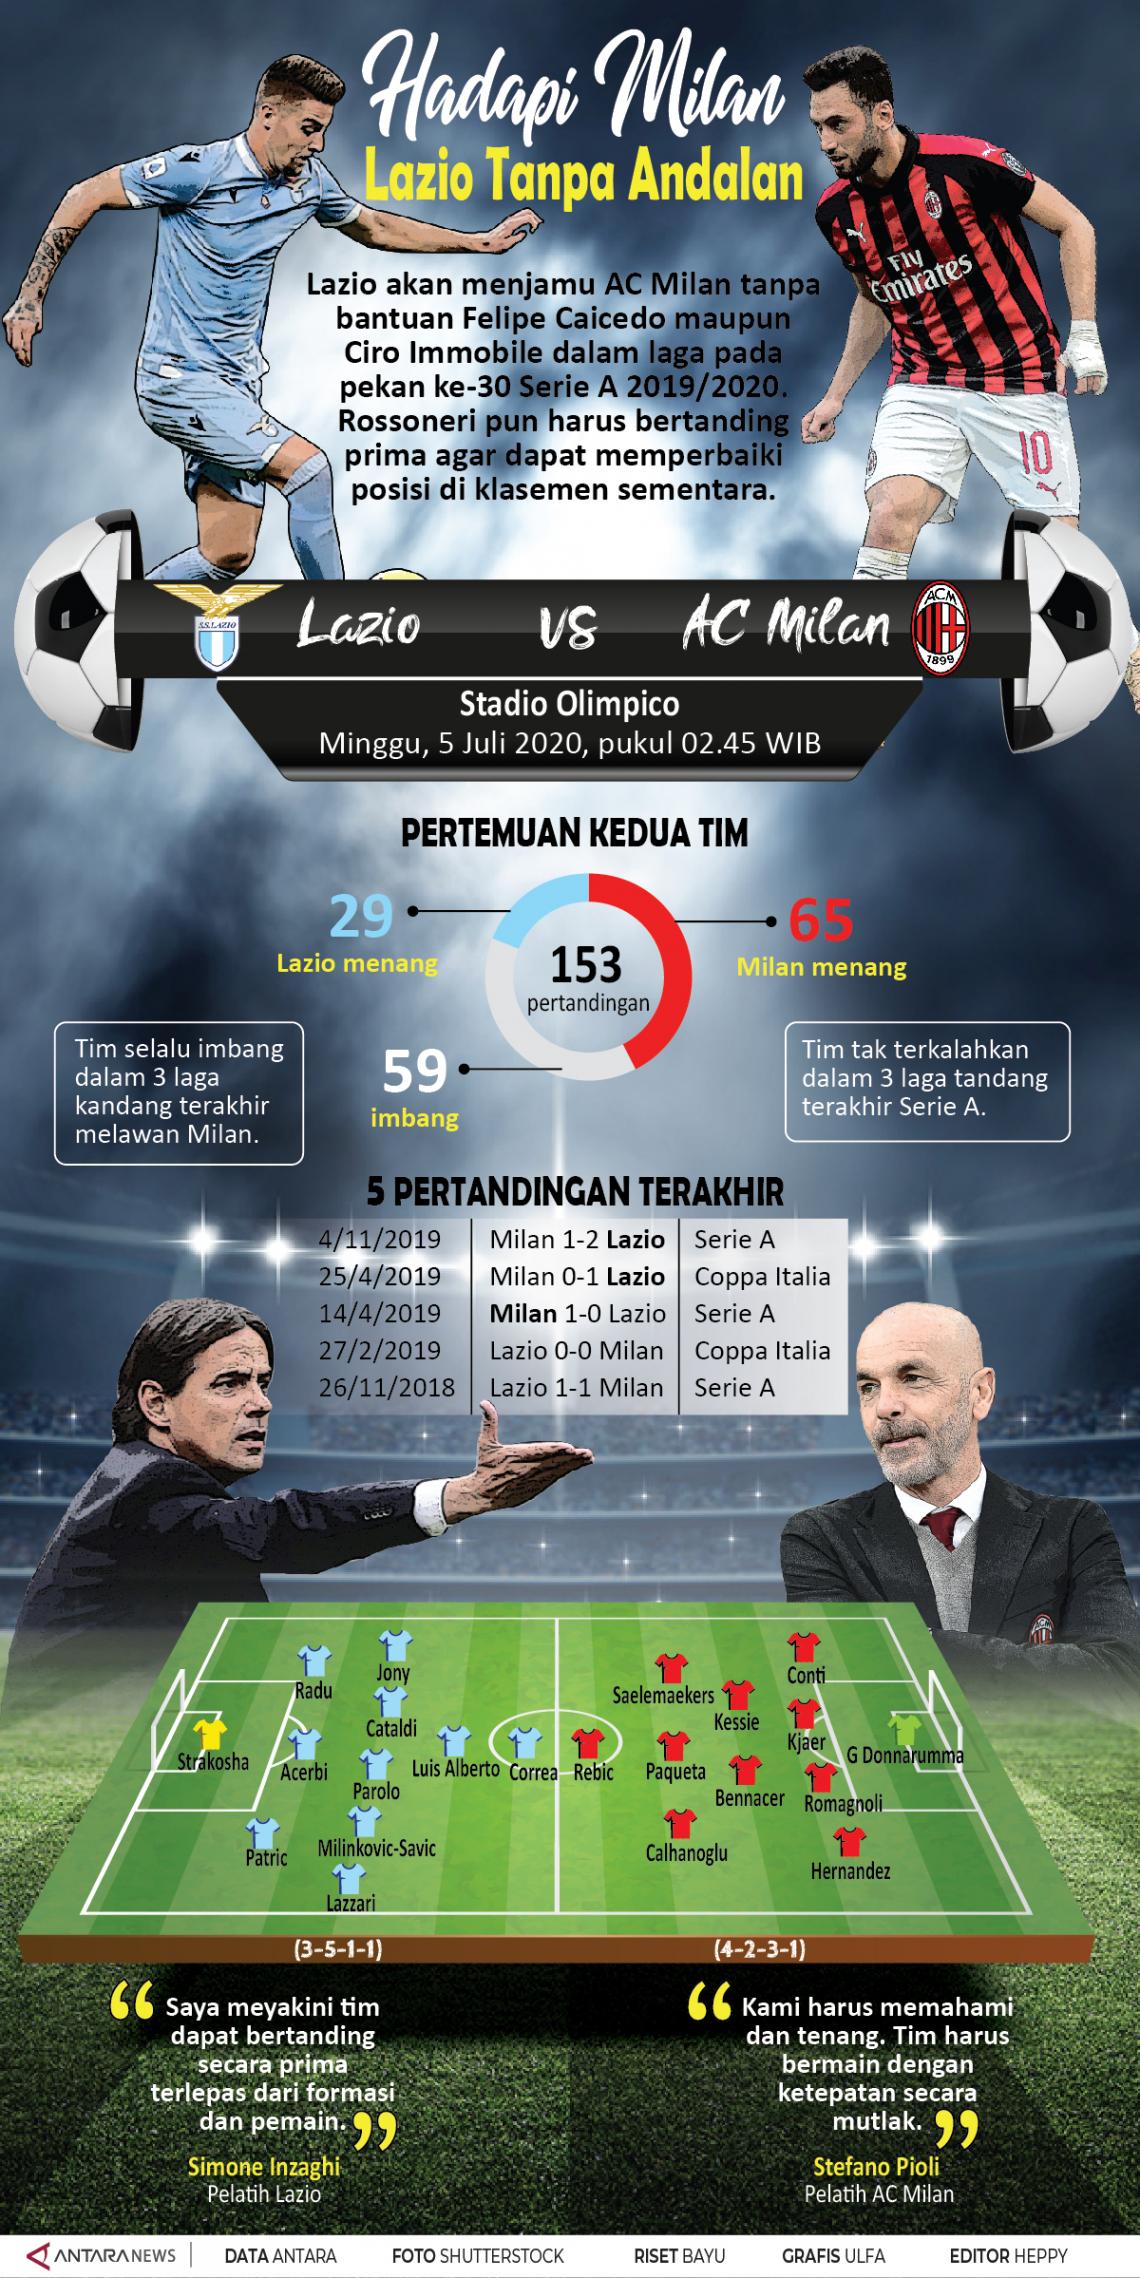 Hadapi Milan, Lazio tanpa andalan